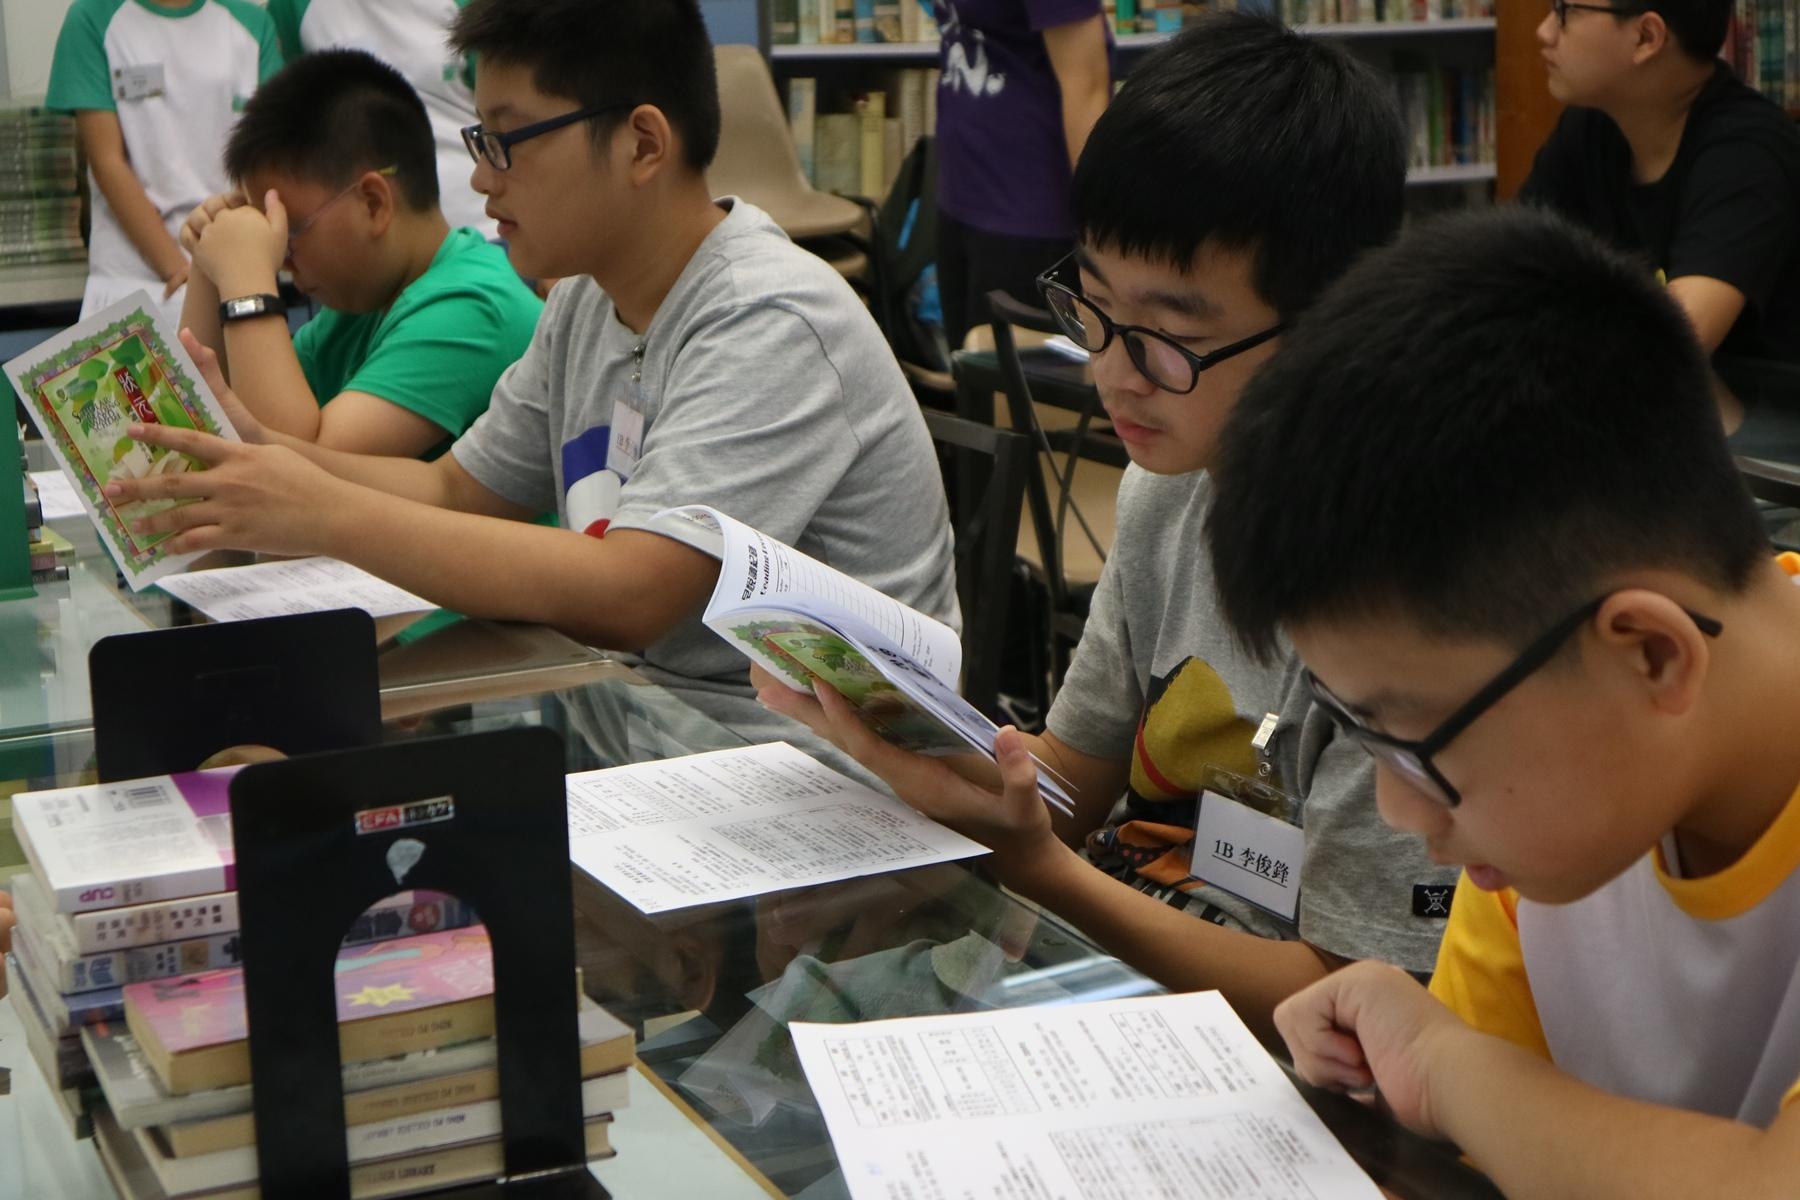 https://www.npc.edu.hk/sites/default/files/1b_kai_qi_zhi_shi_03.jpg